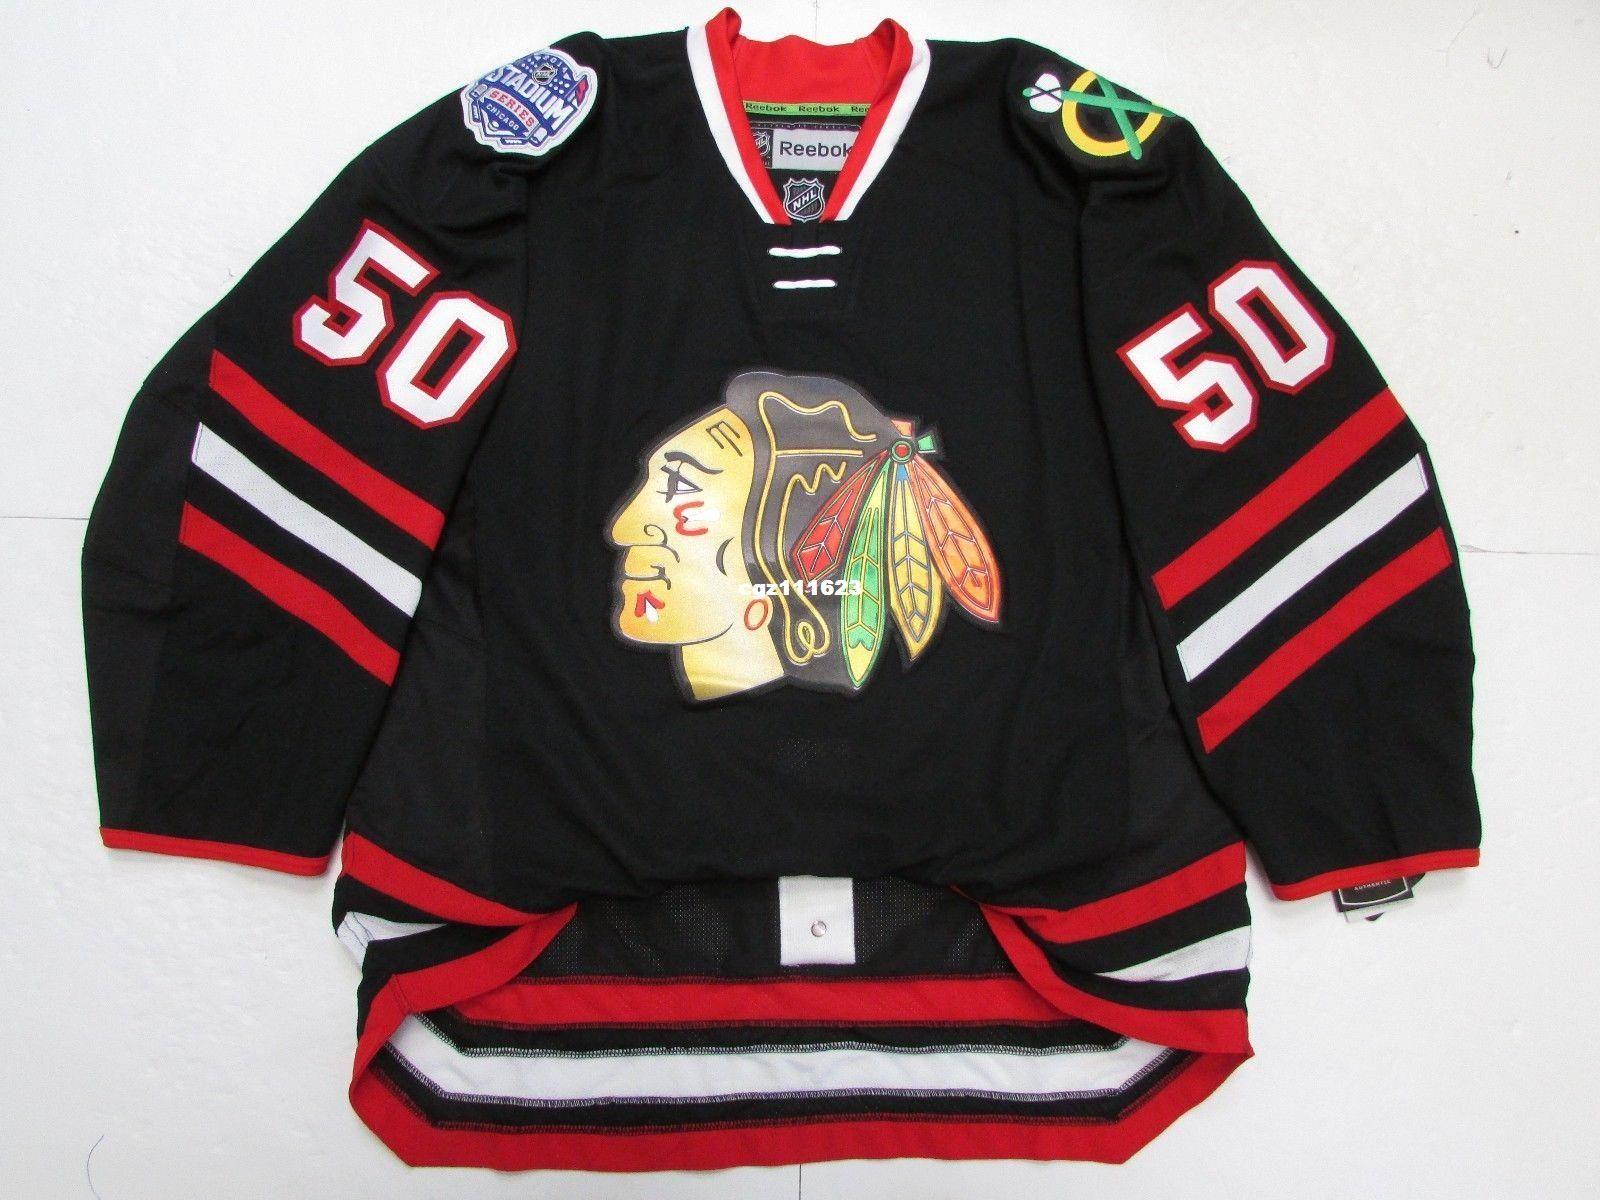 43bfec0e62d 2019 Cheap Custom CRAWFORD CHICAGO BLACKHAWKS Ice Hockey Jerseys 2014  STADIUM SERIES Stitched JERSEY From Cgz111623, $25.59 | DHgate.Com